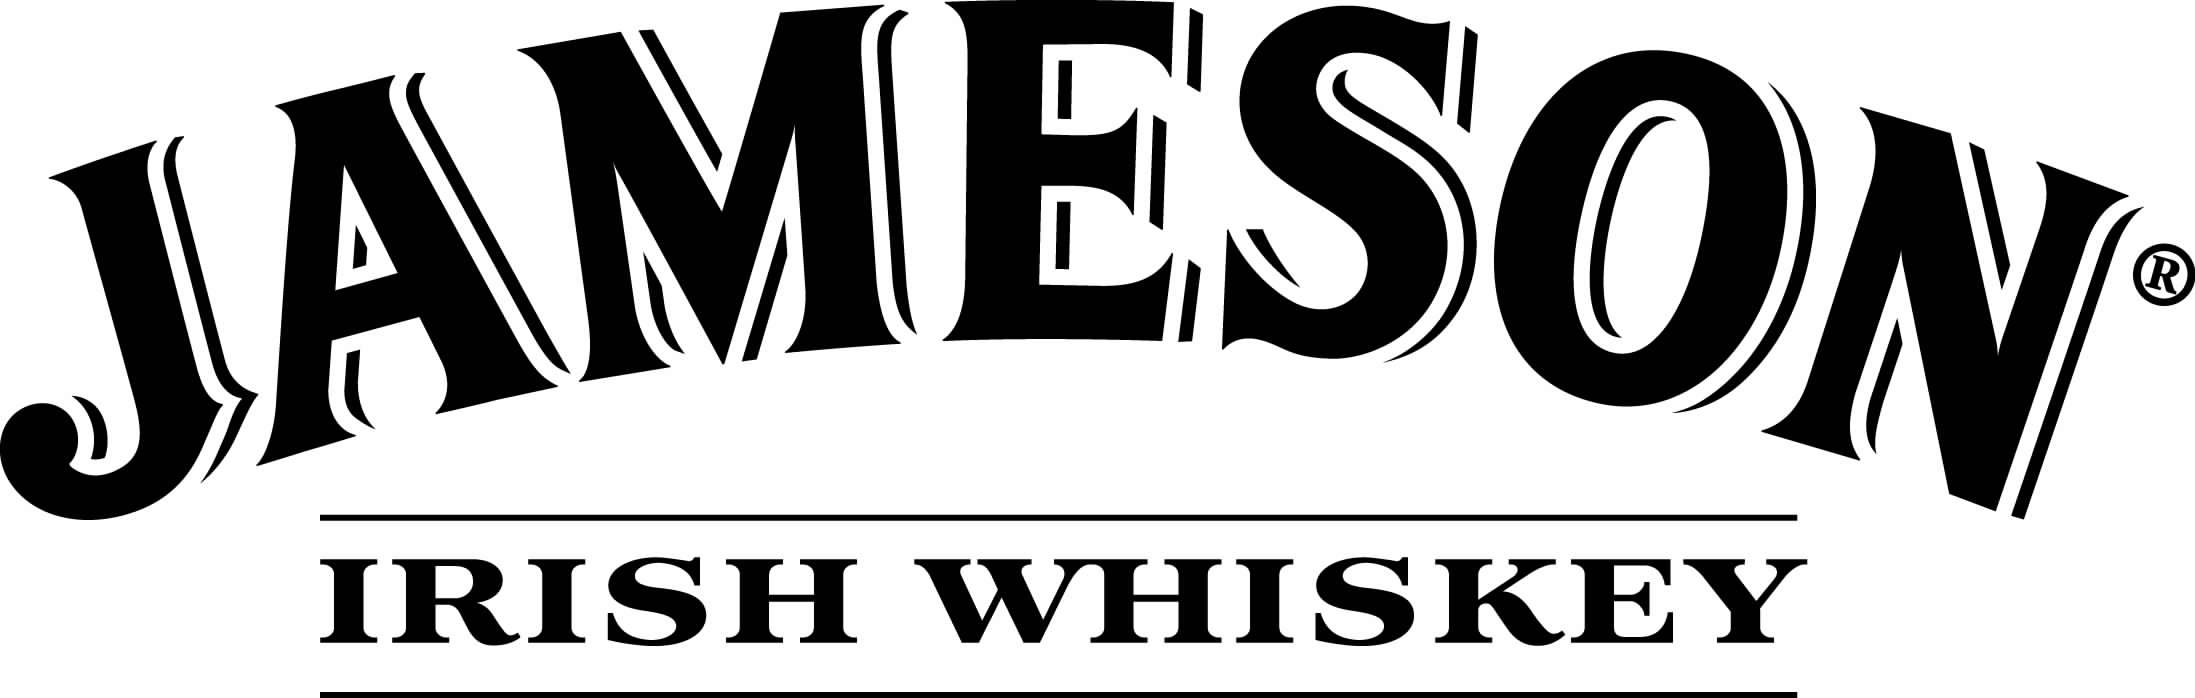 jameson_logo2